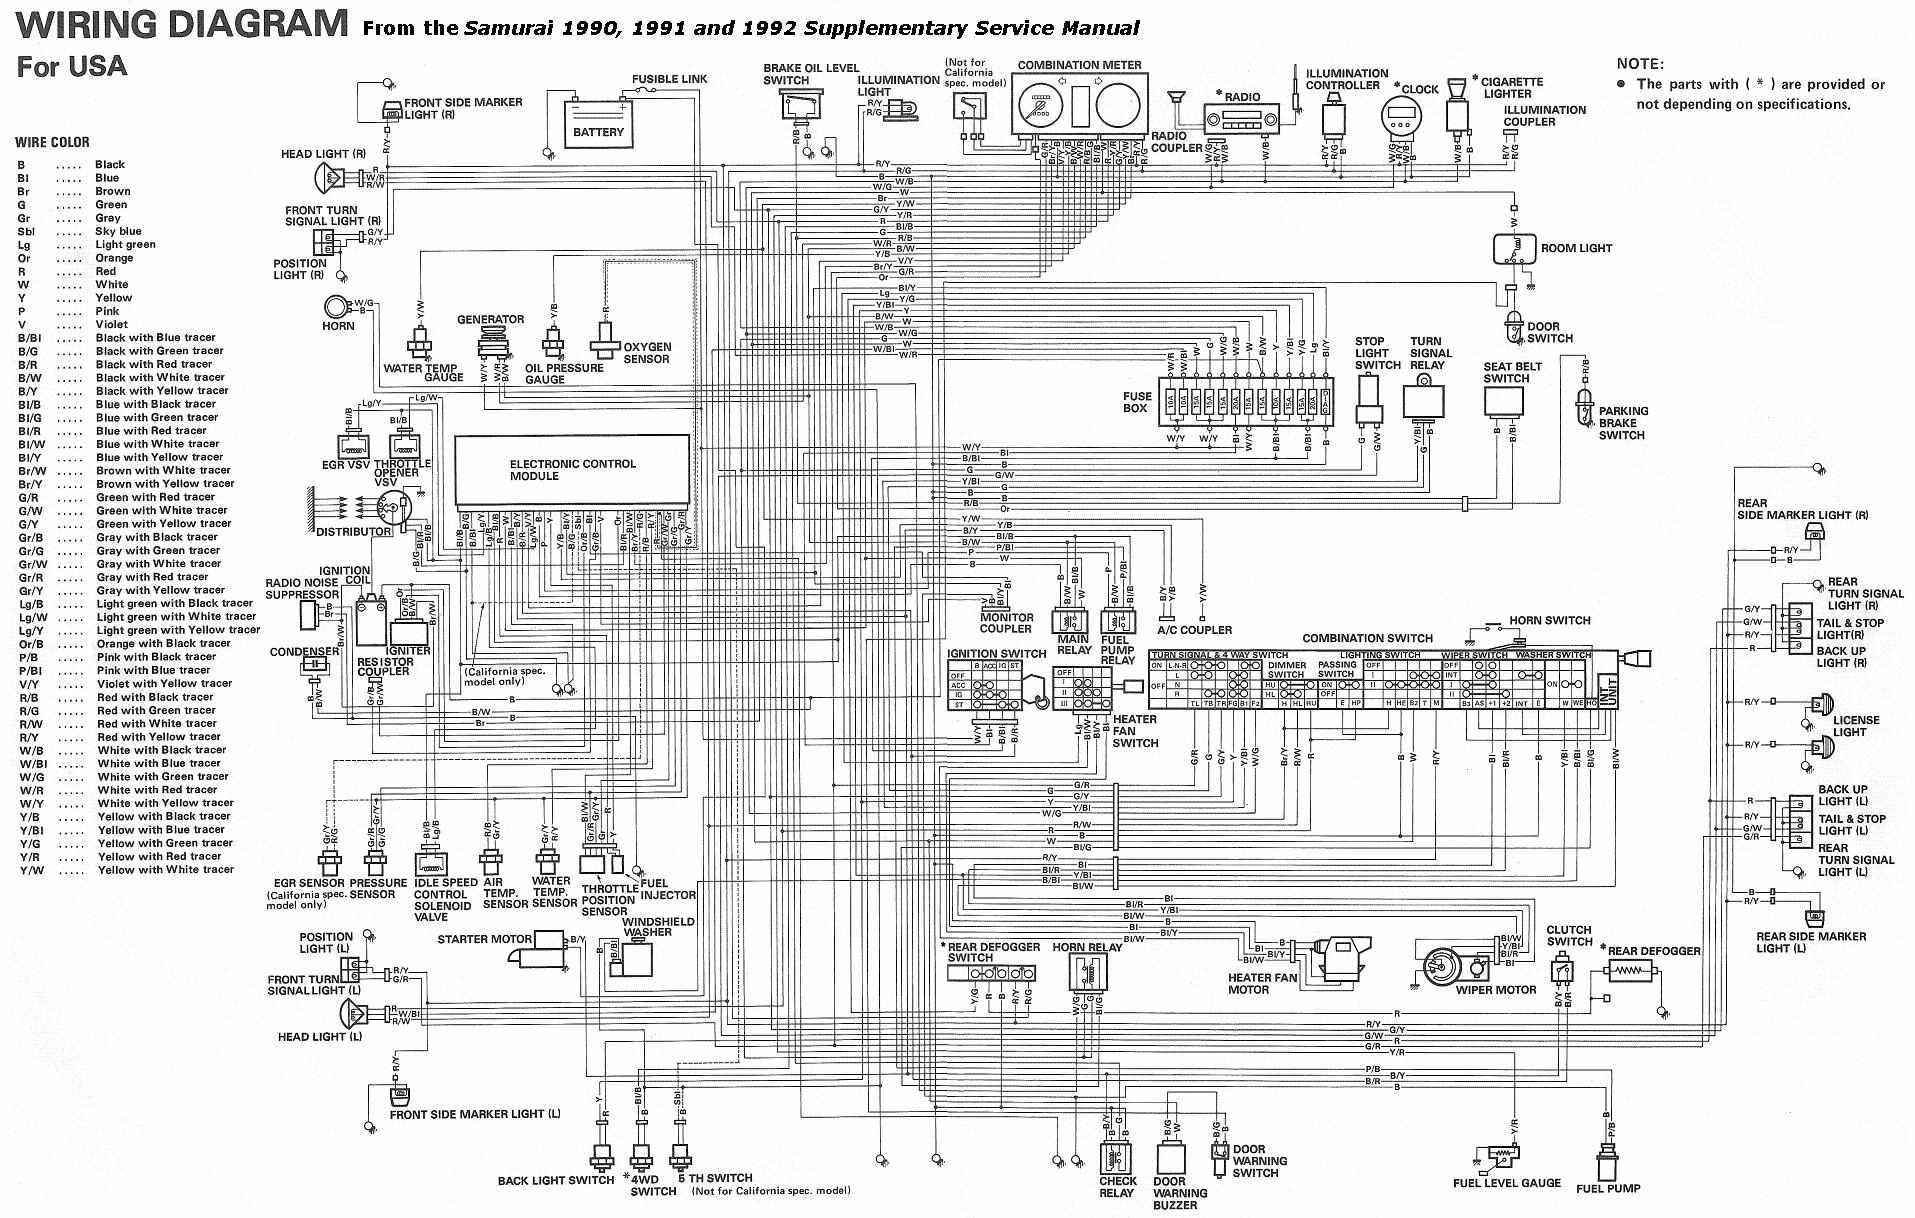 medium resolution of wipercar wiring diagram trusted wiring diagram rh 9 1 gartenmoebel rupp de wiper wiring diagram 2001 vw beetle wiper wiring diagram 1986 k10